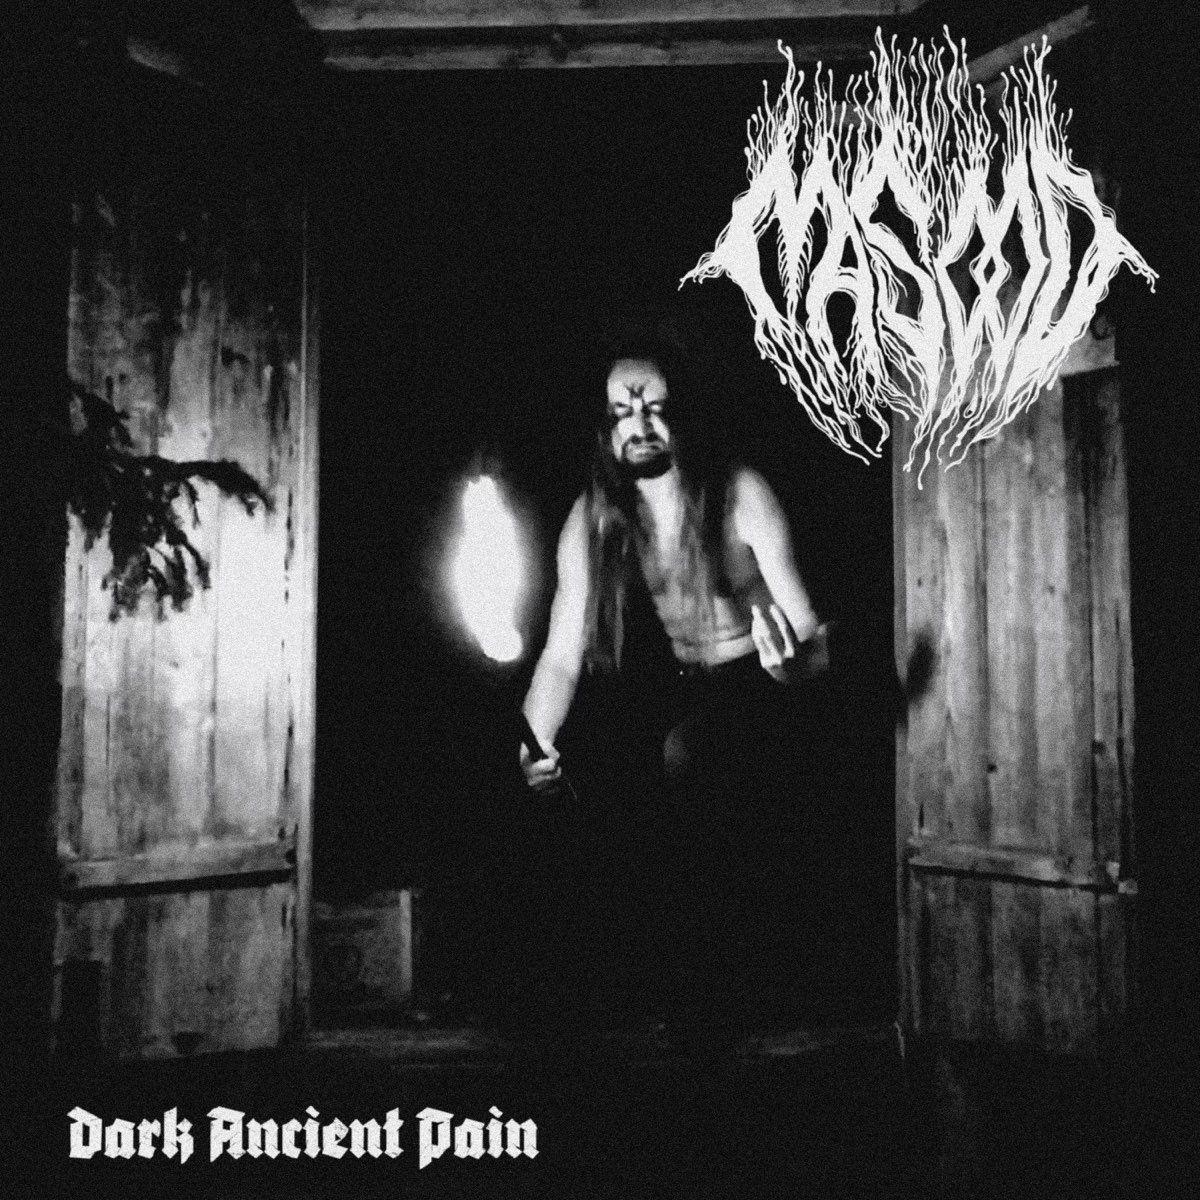 Masood - Dark Ancient Pain